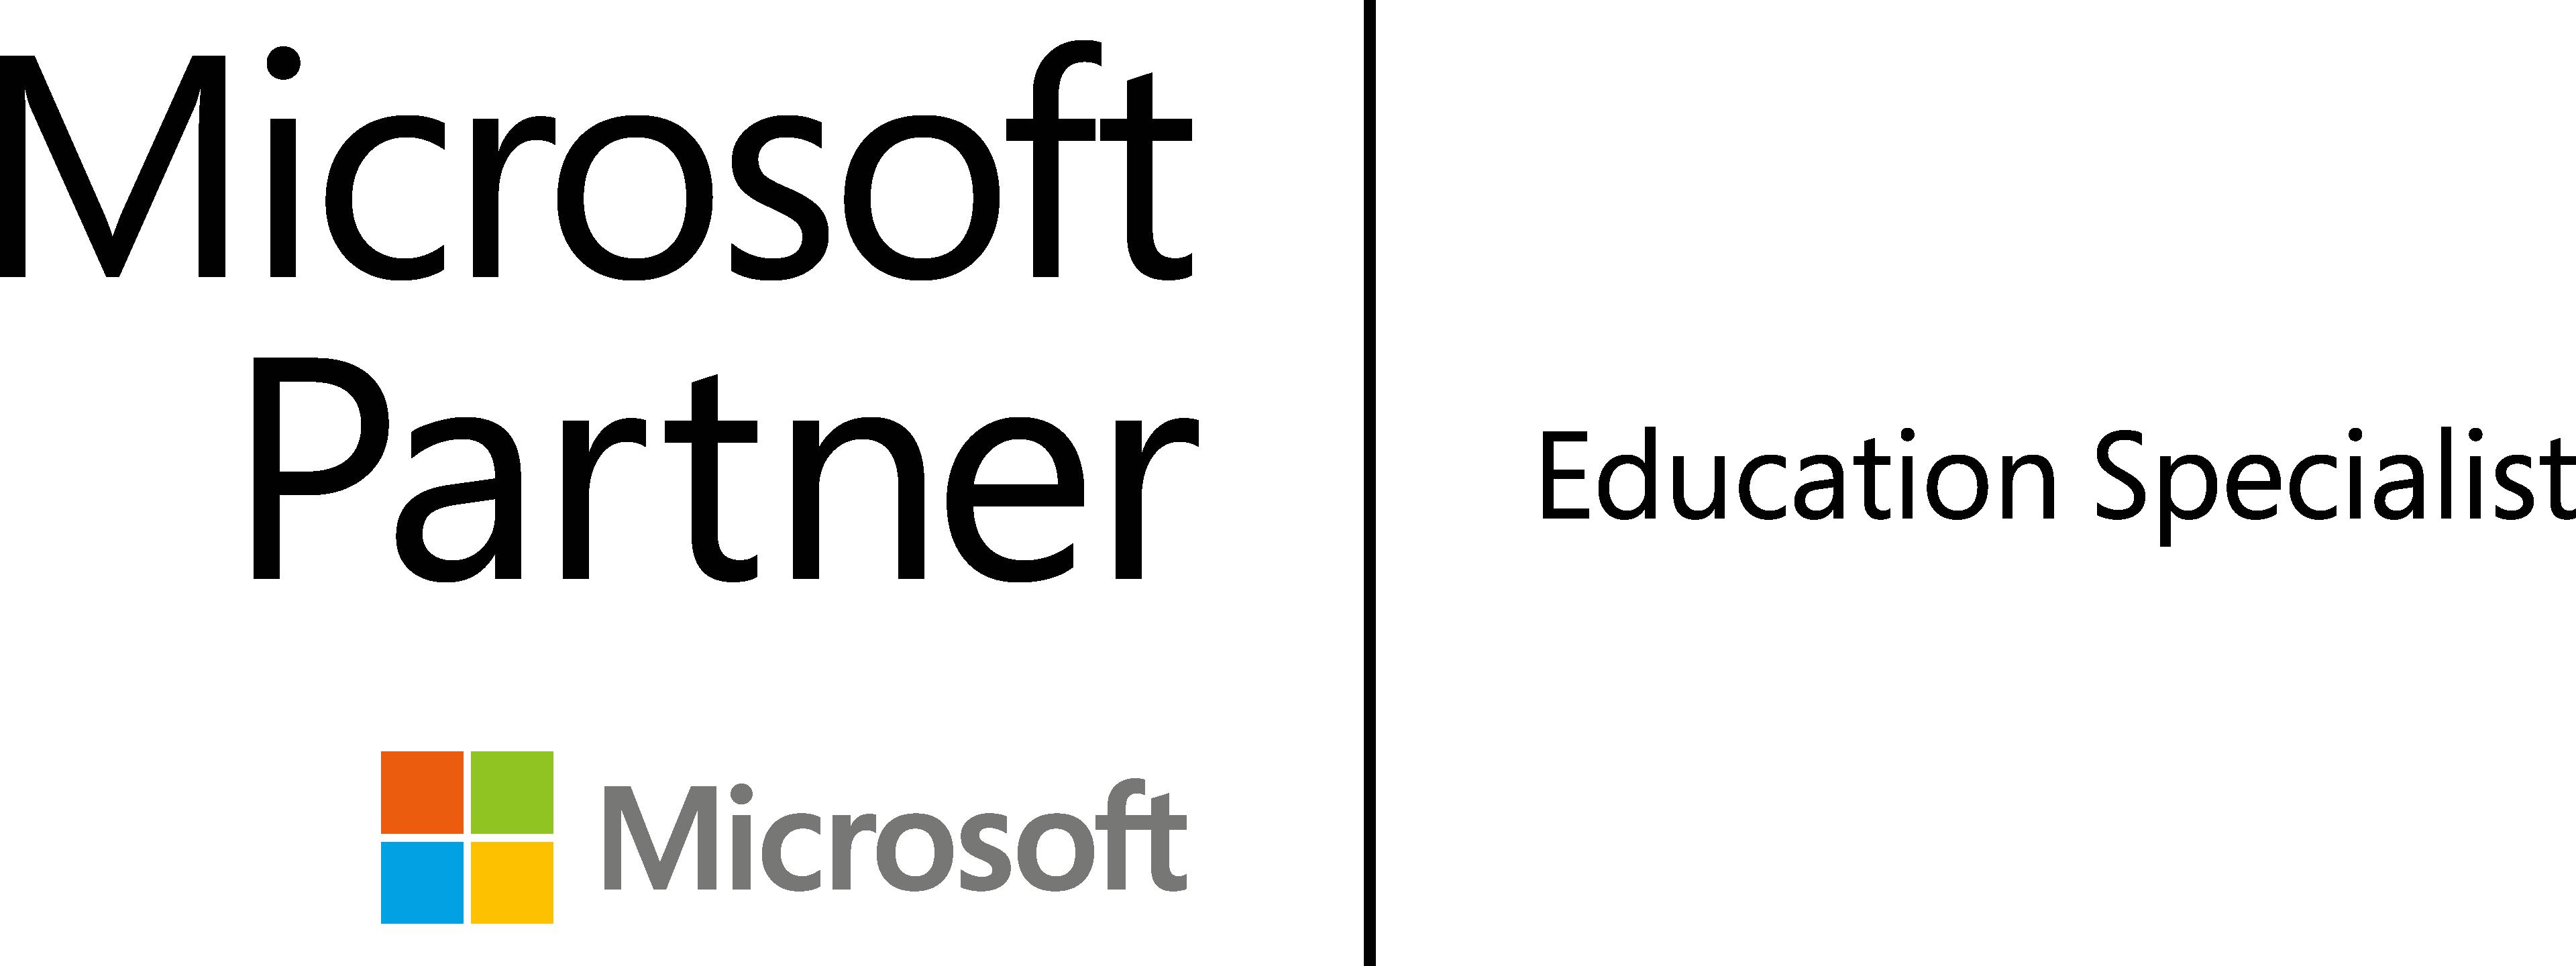 Microsoft Education Specialist Partner badge_HR